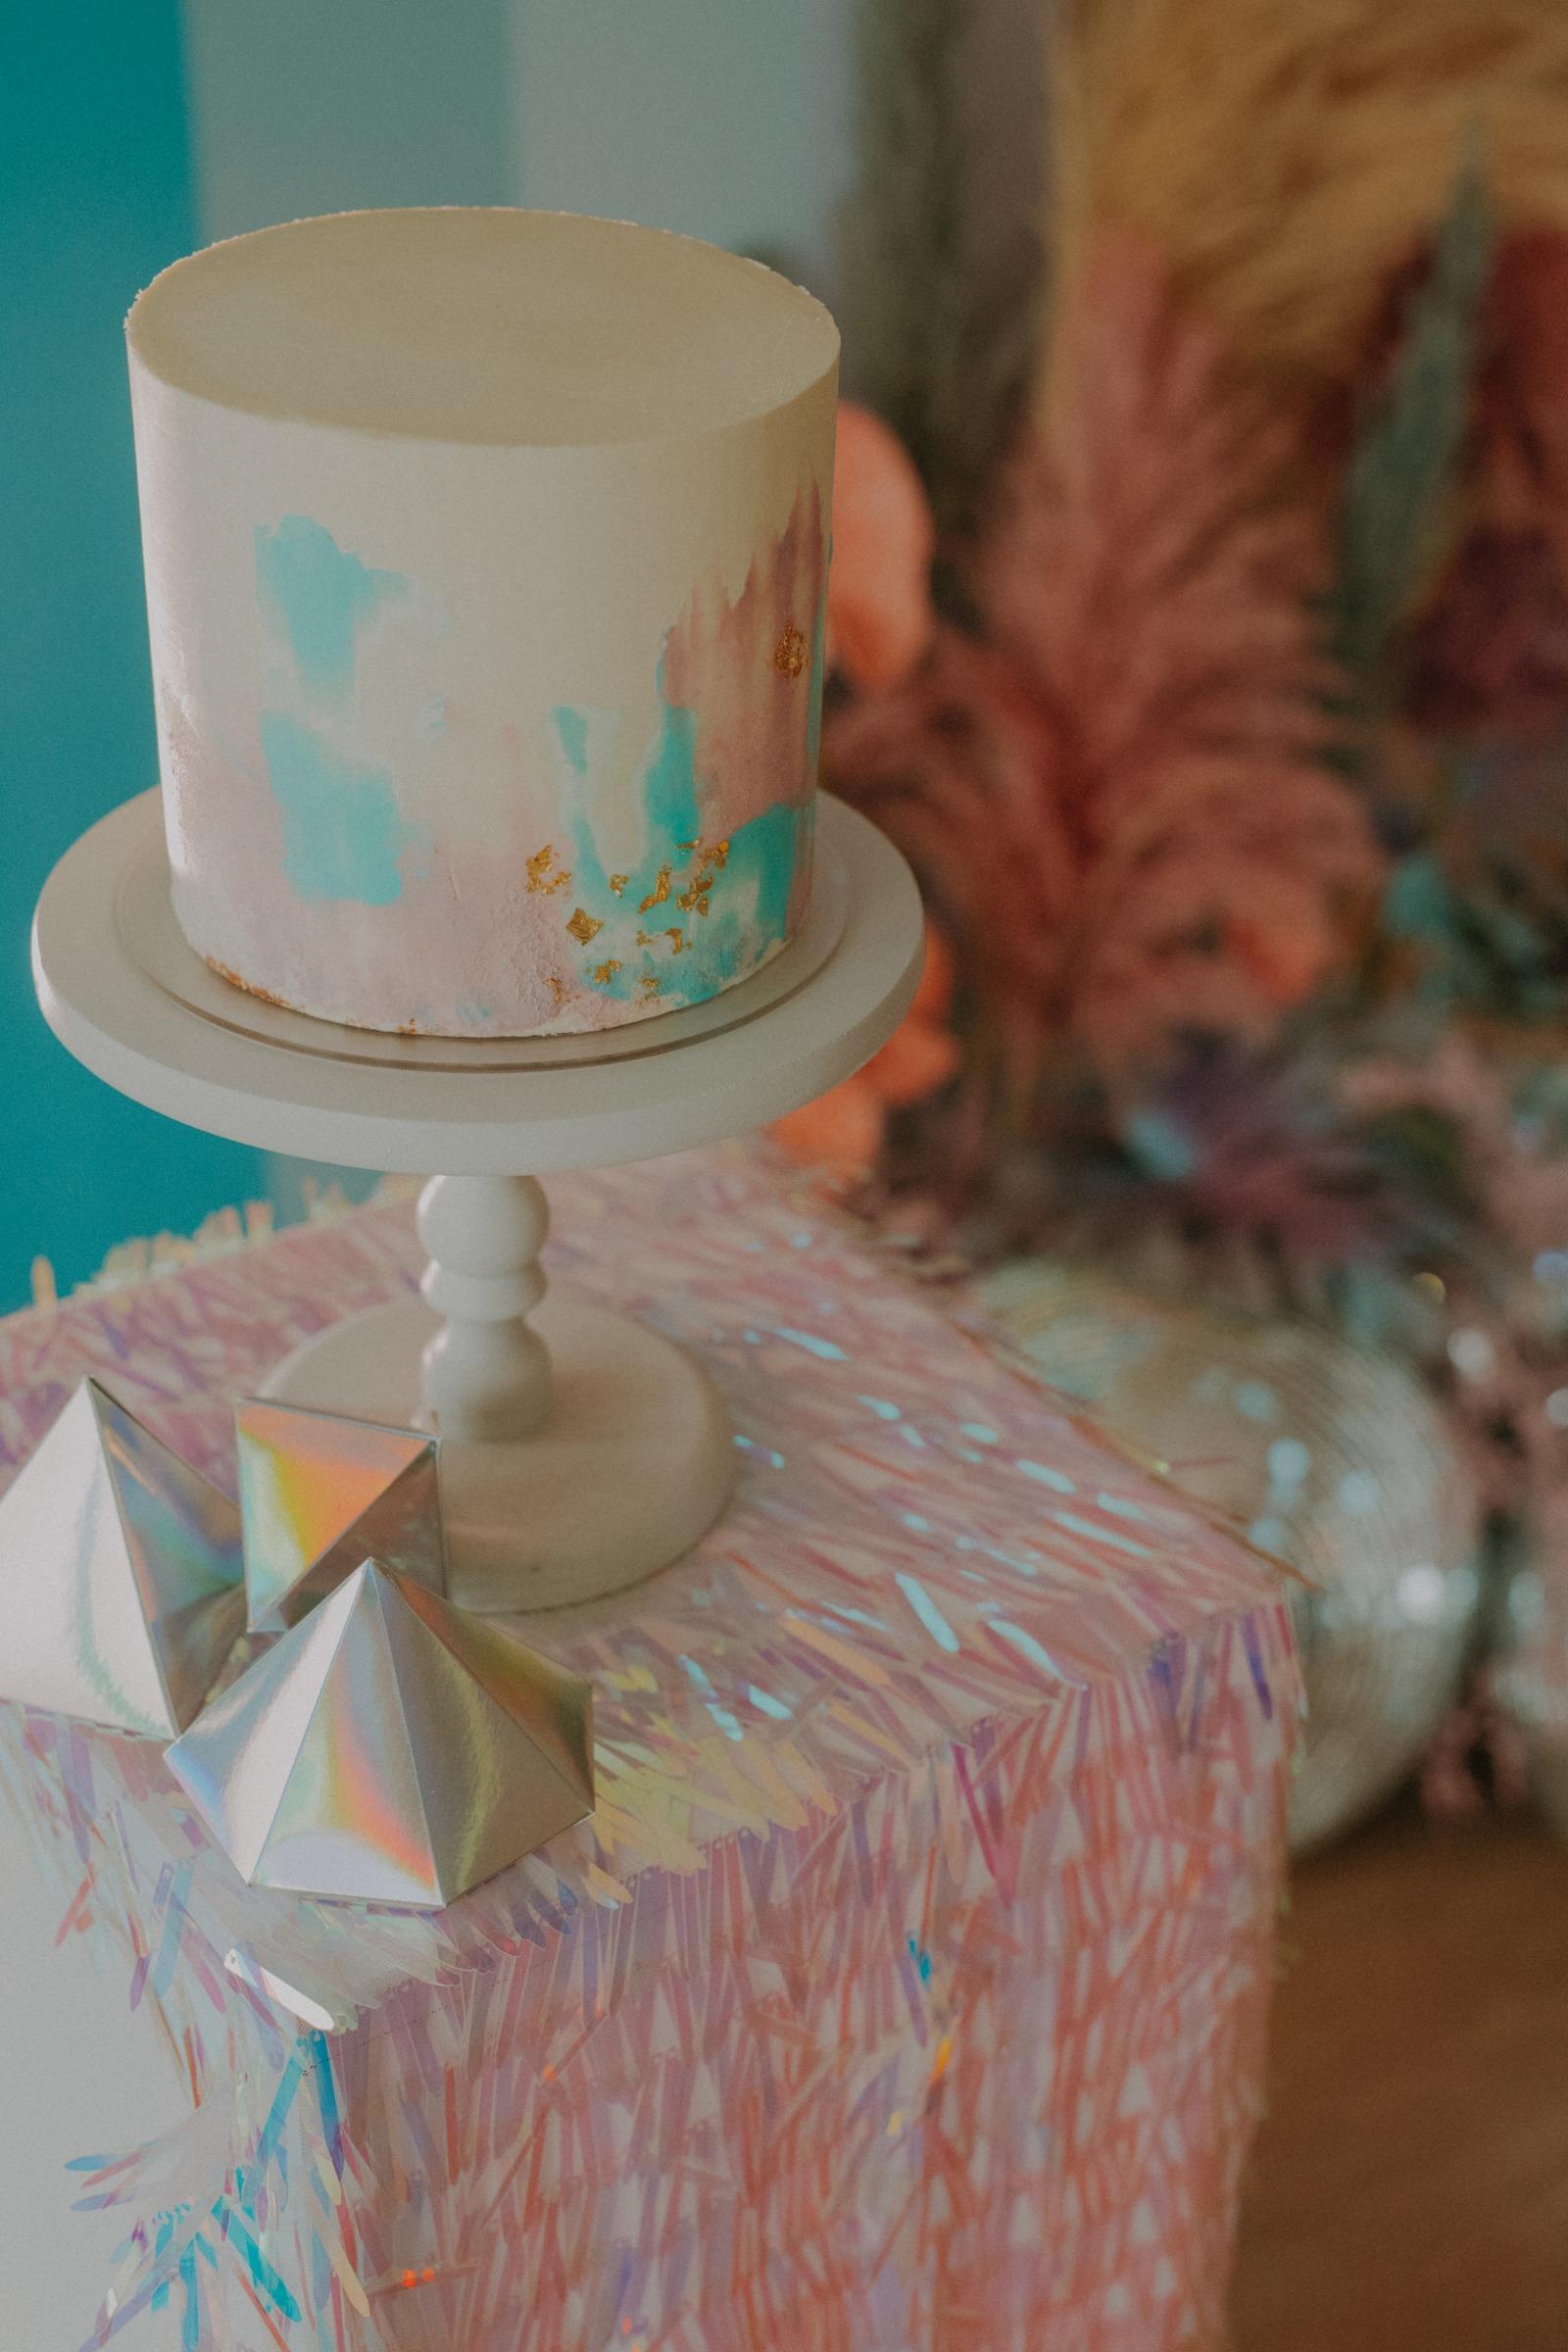 colourful pastel wedding - unconventional wedding - alternative wedding - small wedding cake - micro wedding cake - quirky wedding cake